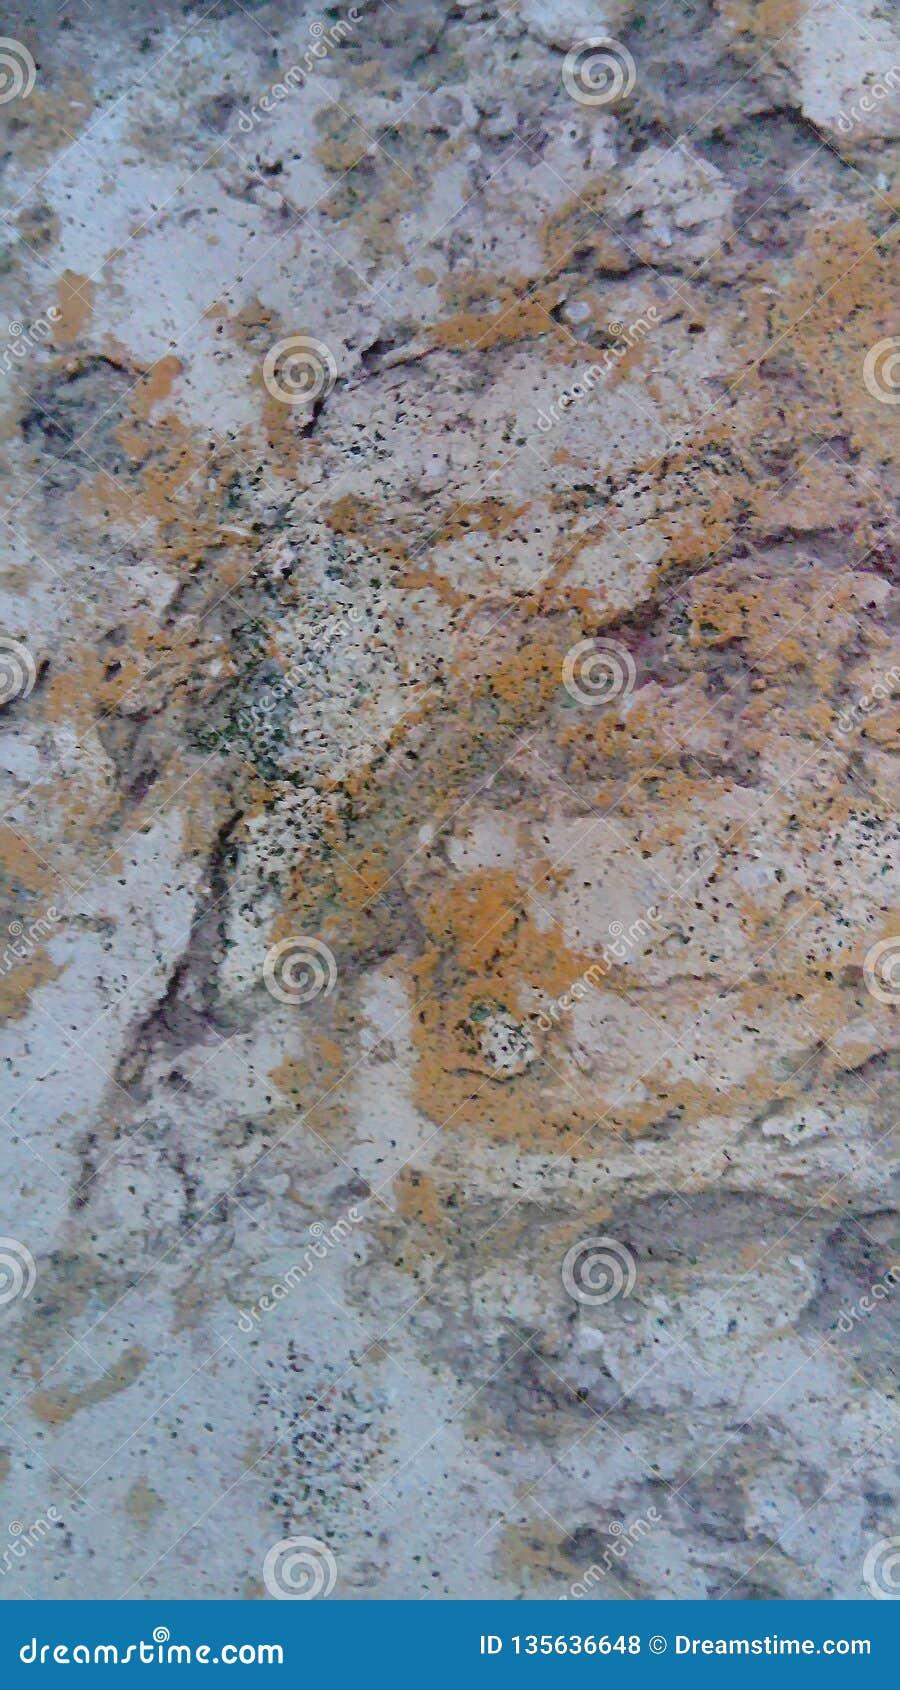 Hewn stone surface. White-orange stone surface.